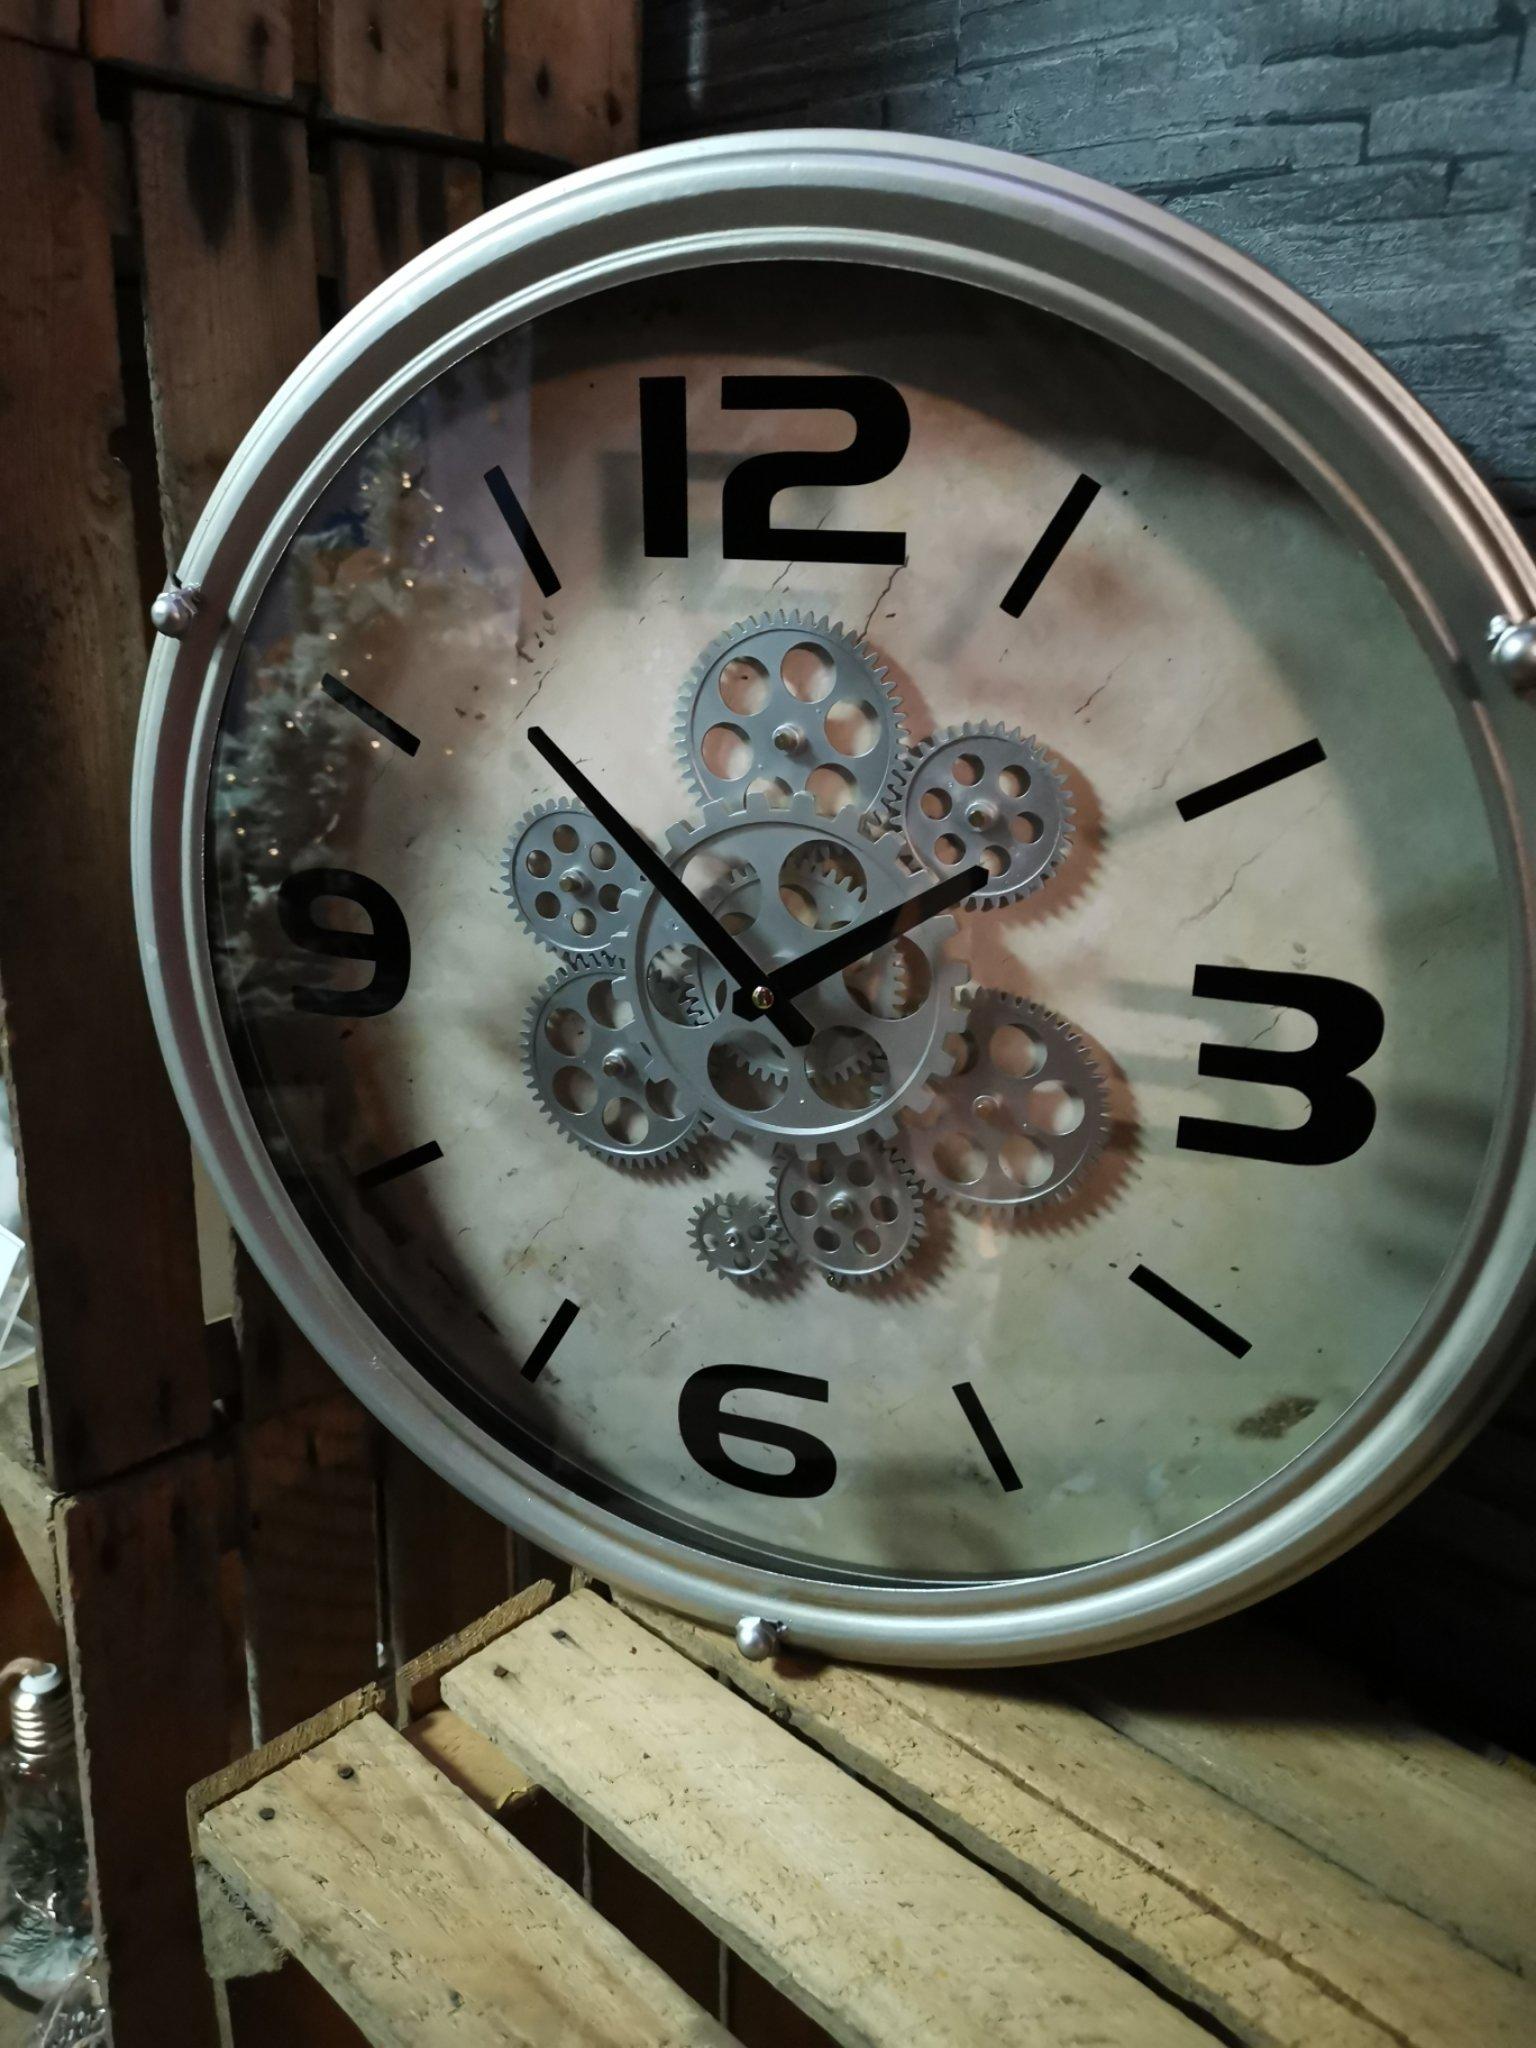 Wandklok tandwiel zilver 01620